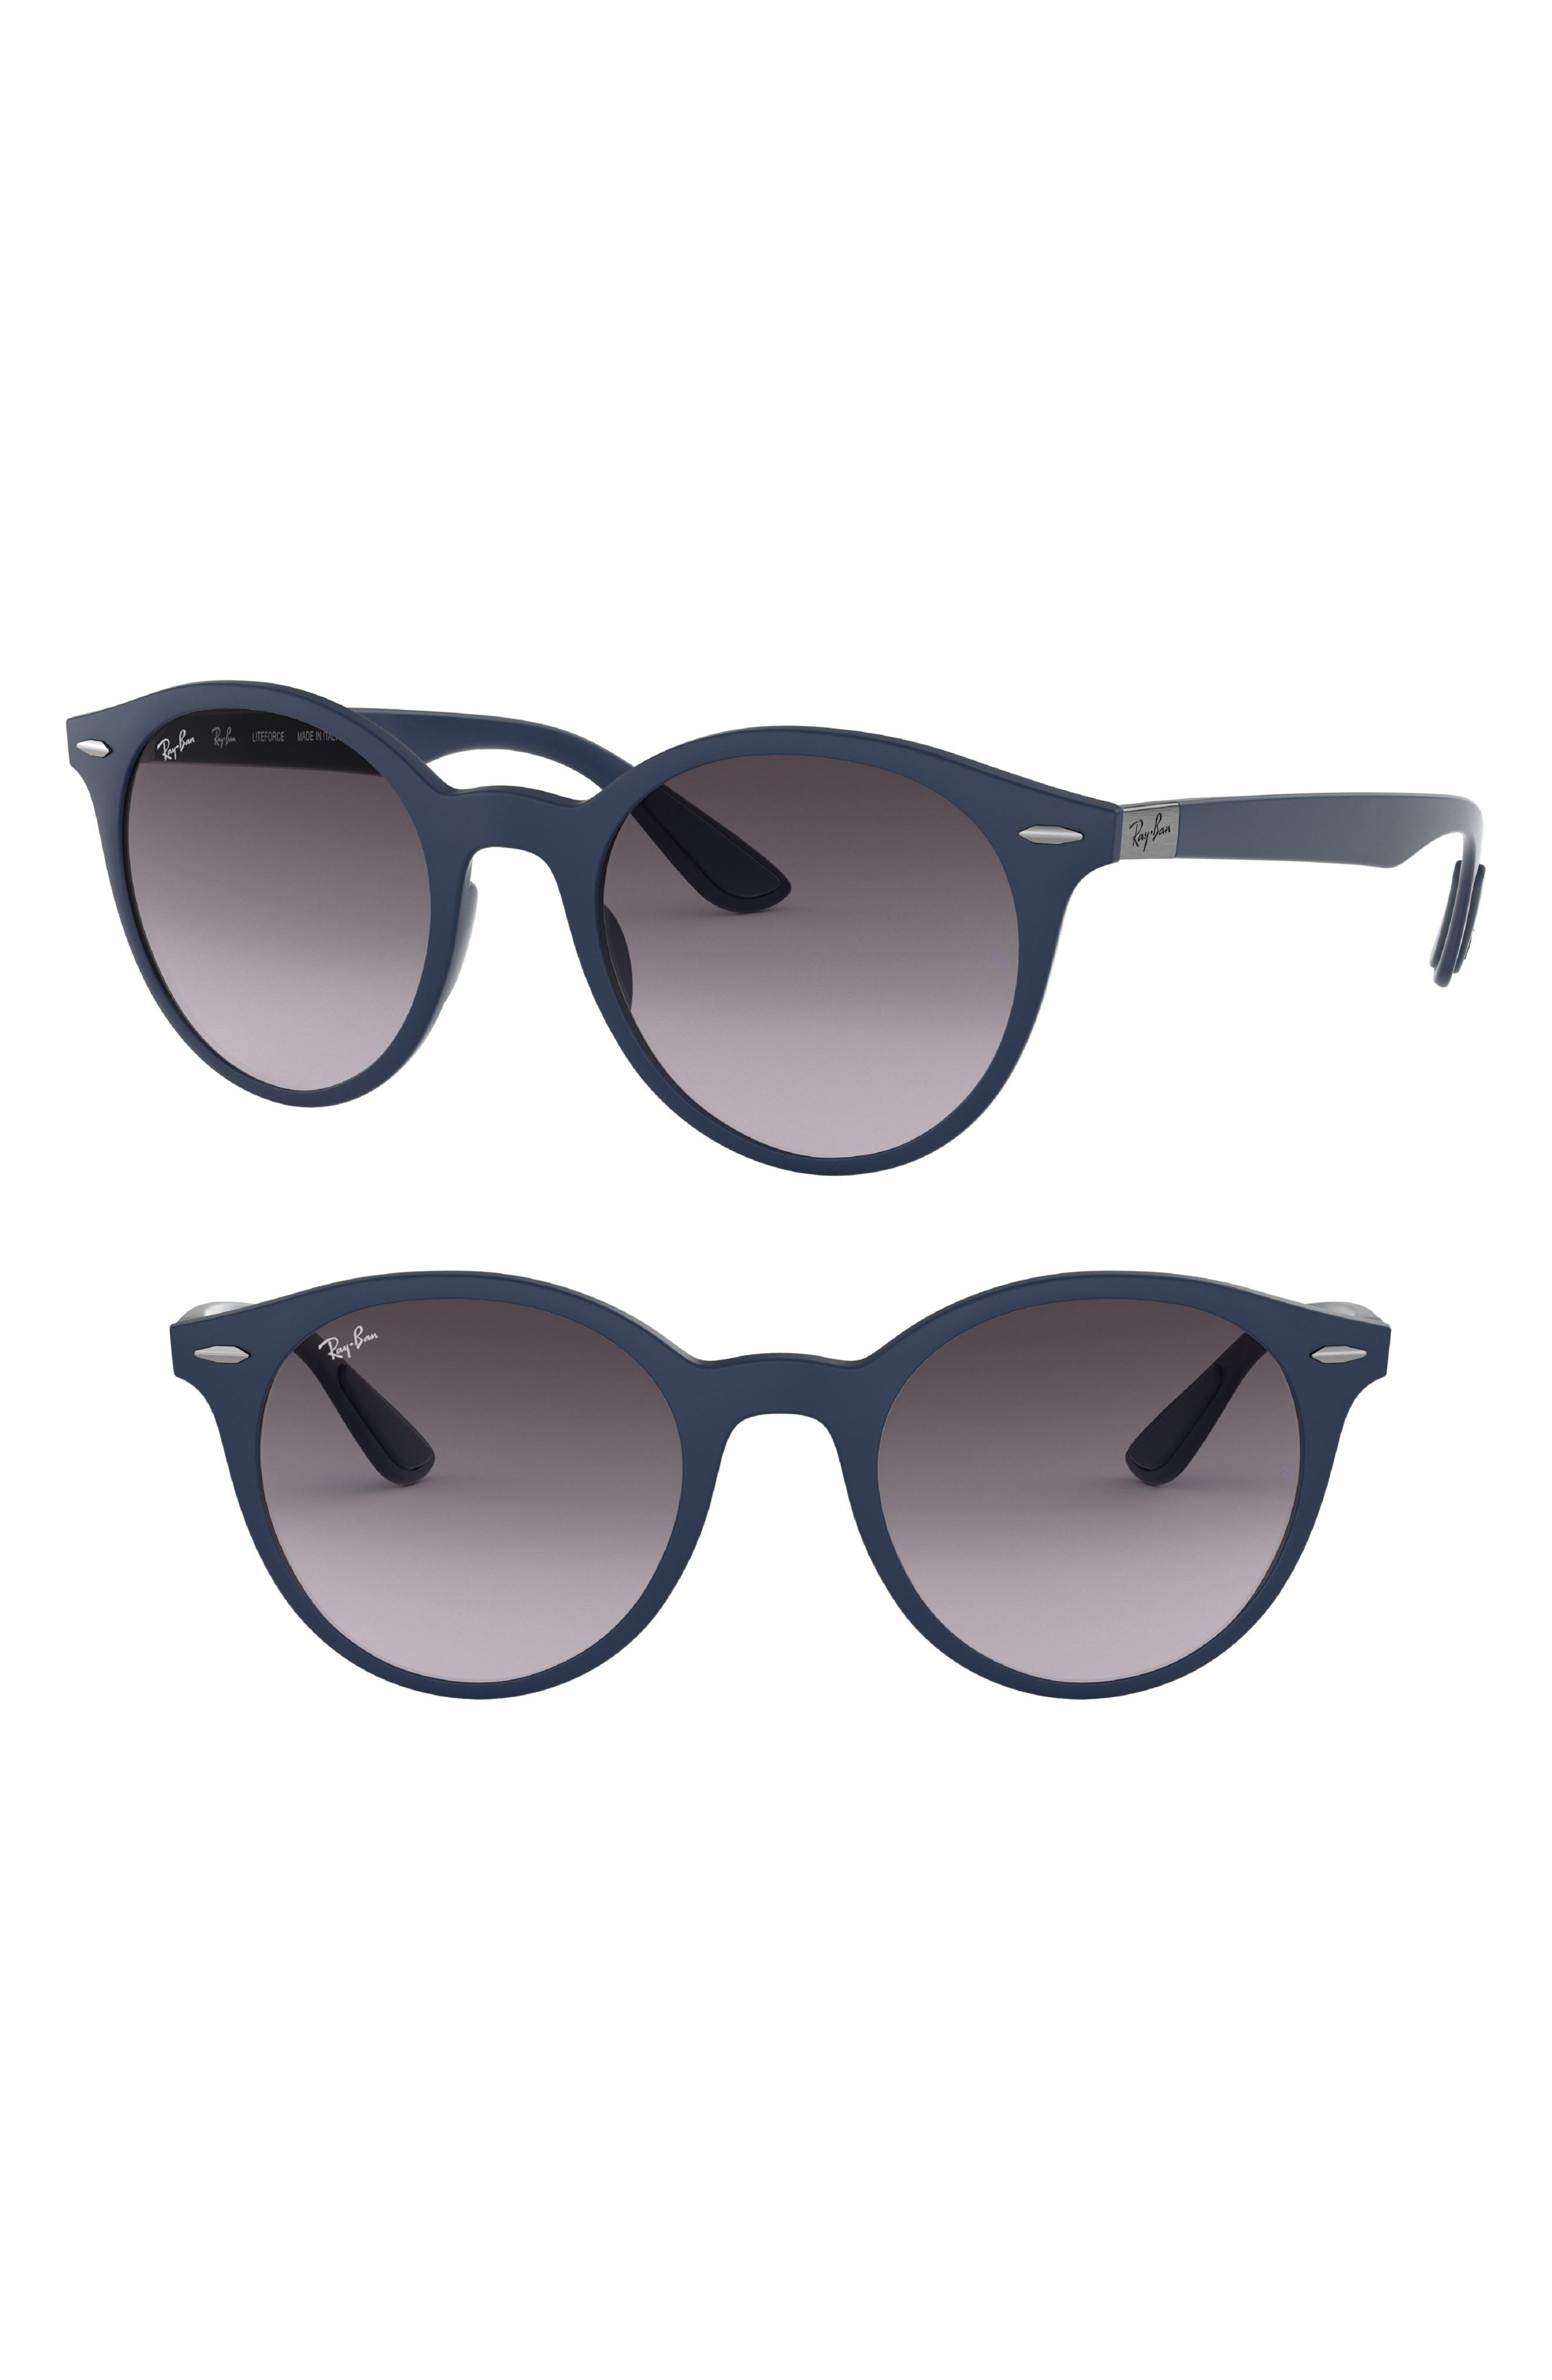 Ray-Ban Phantos 50mm Mirrored Sunglasses